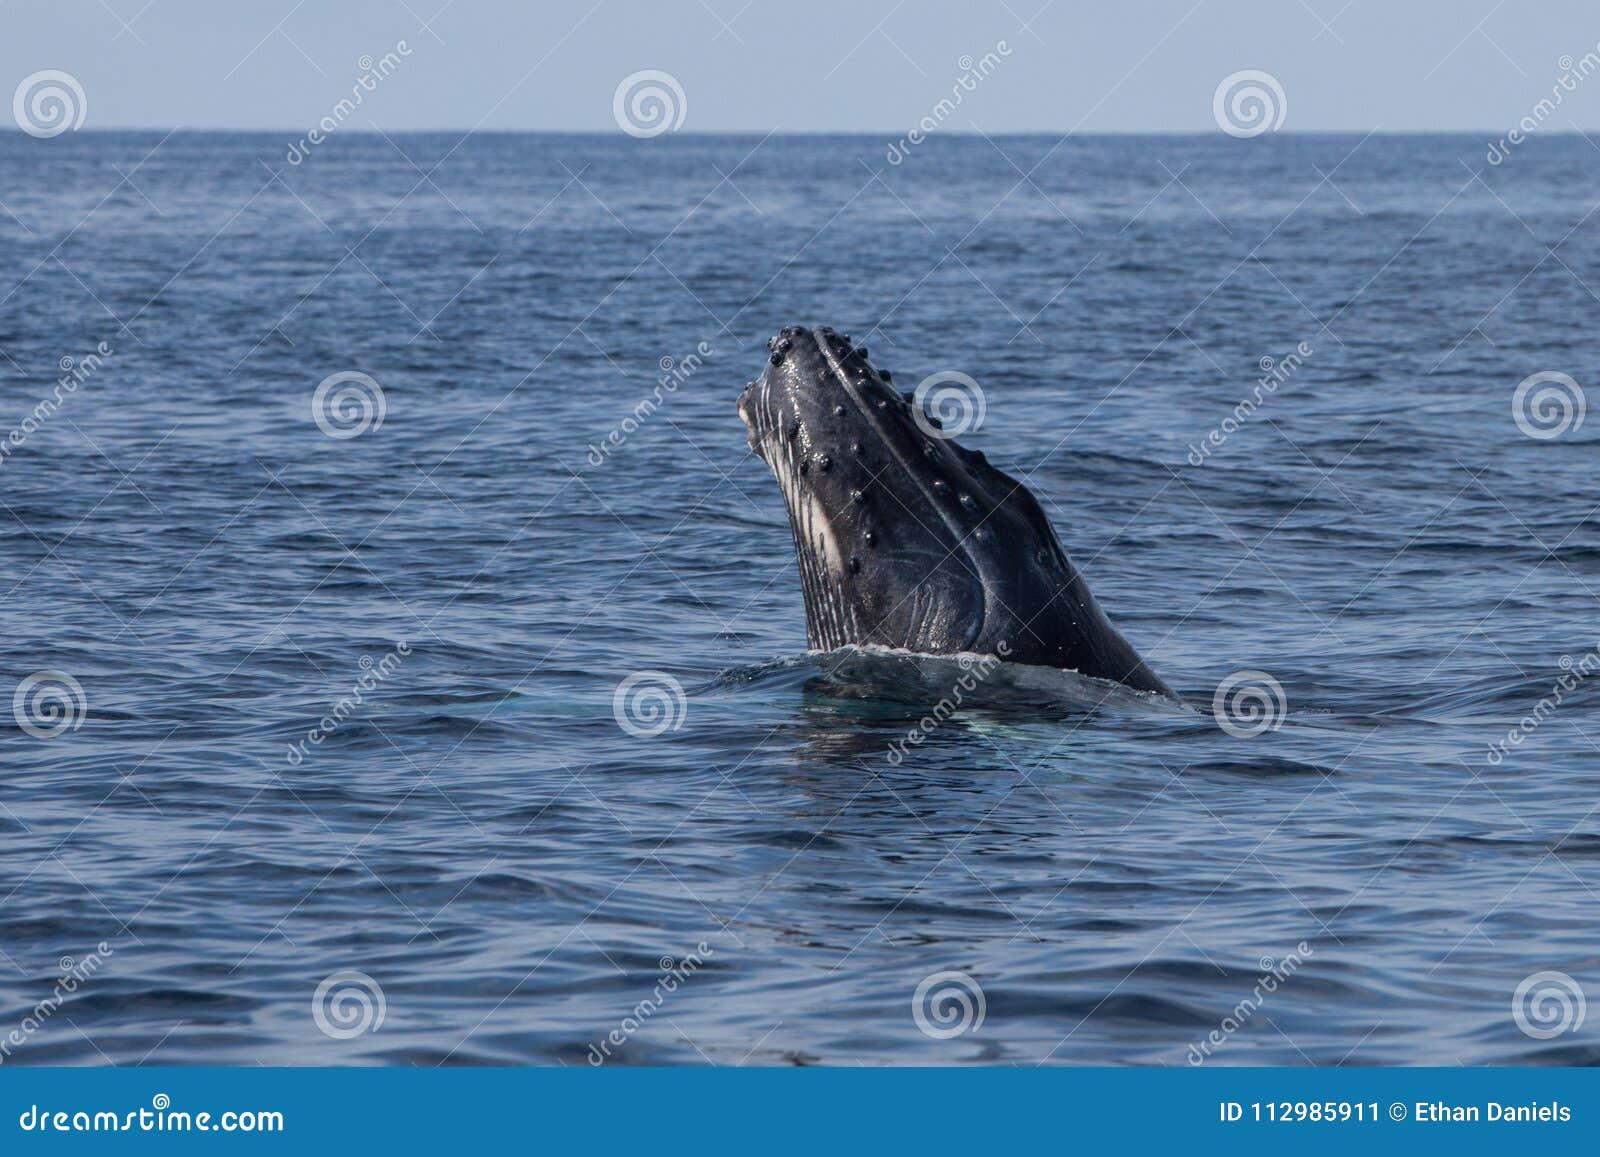 Humpback Whale Calf Emerging From Ocean